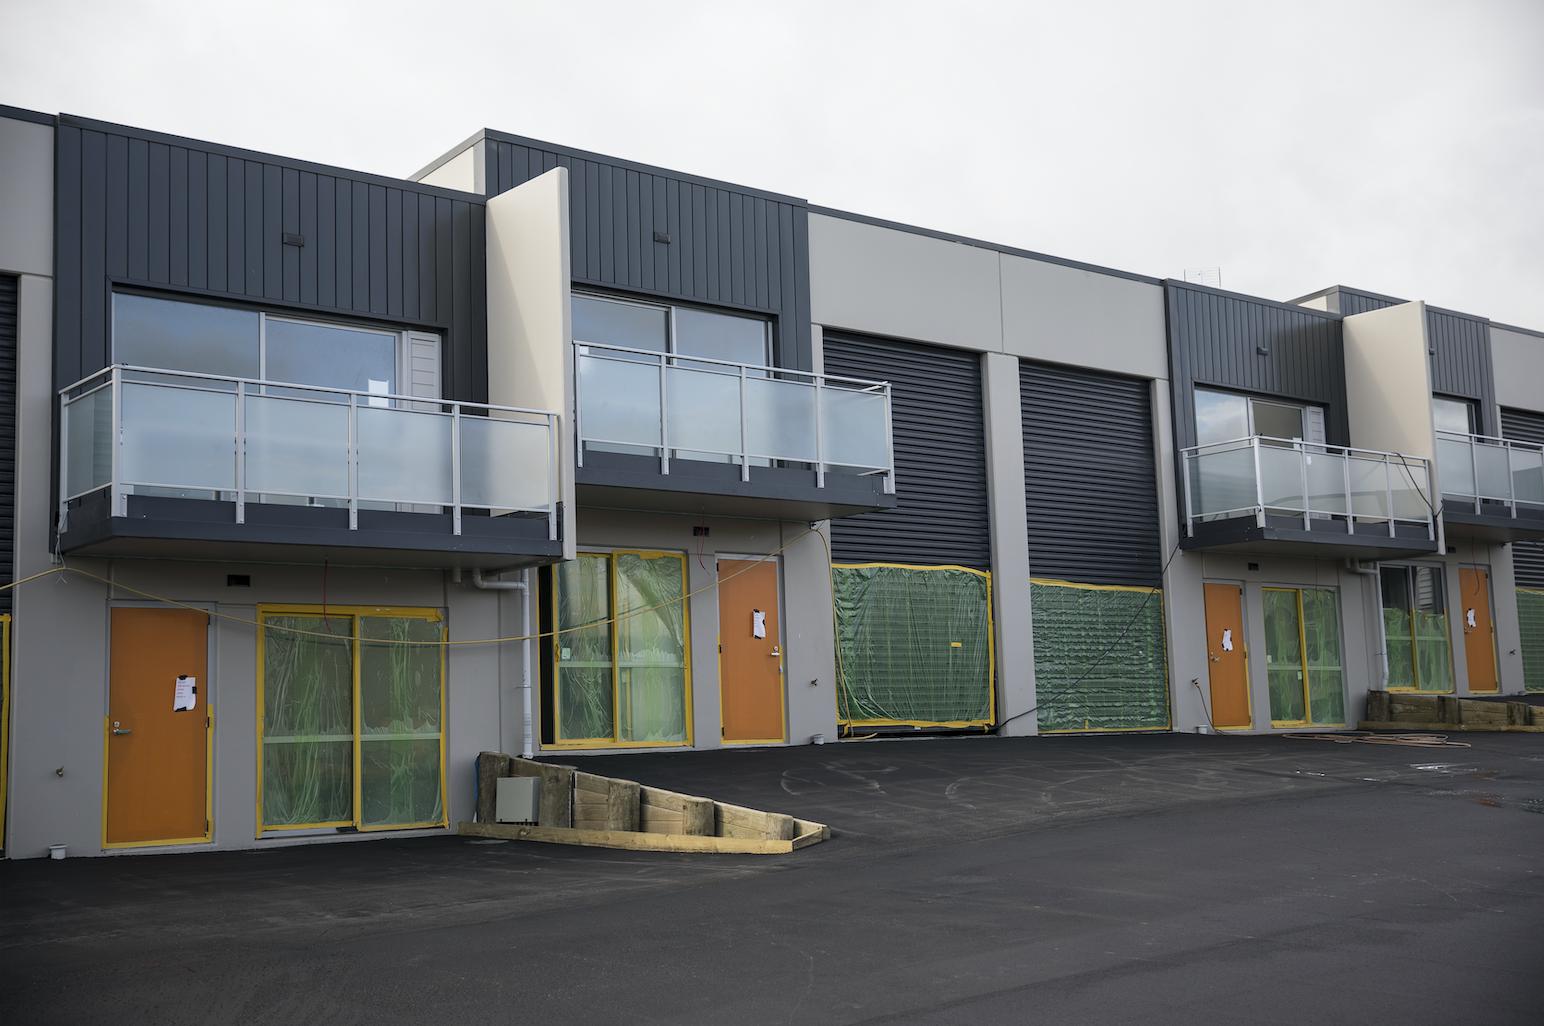 The-Roofing-Store-Steel-Metal-Interlocking-Panel-Windsor-grey-6-LR.png